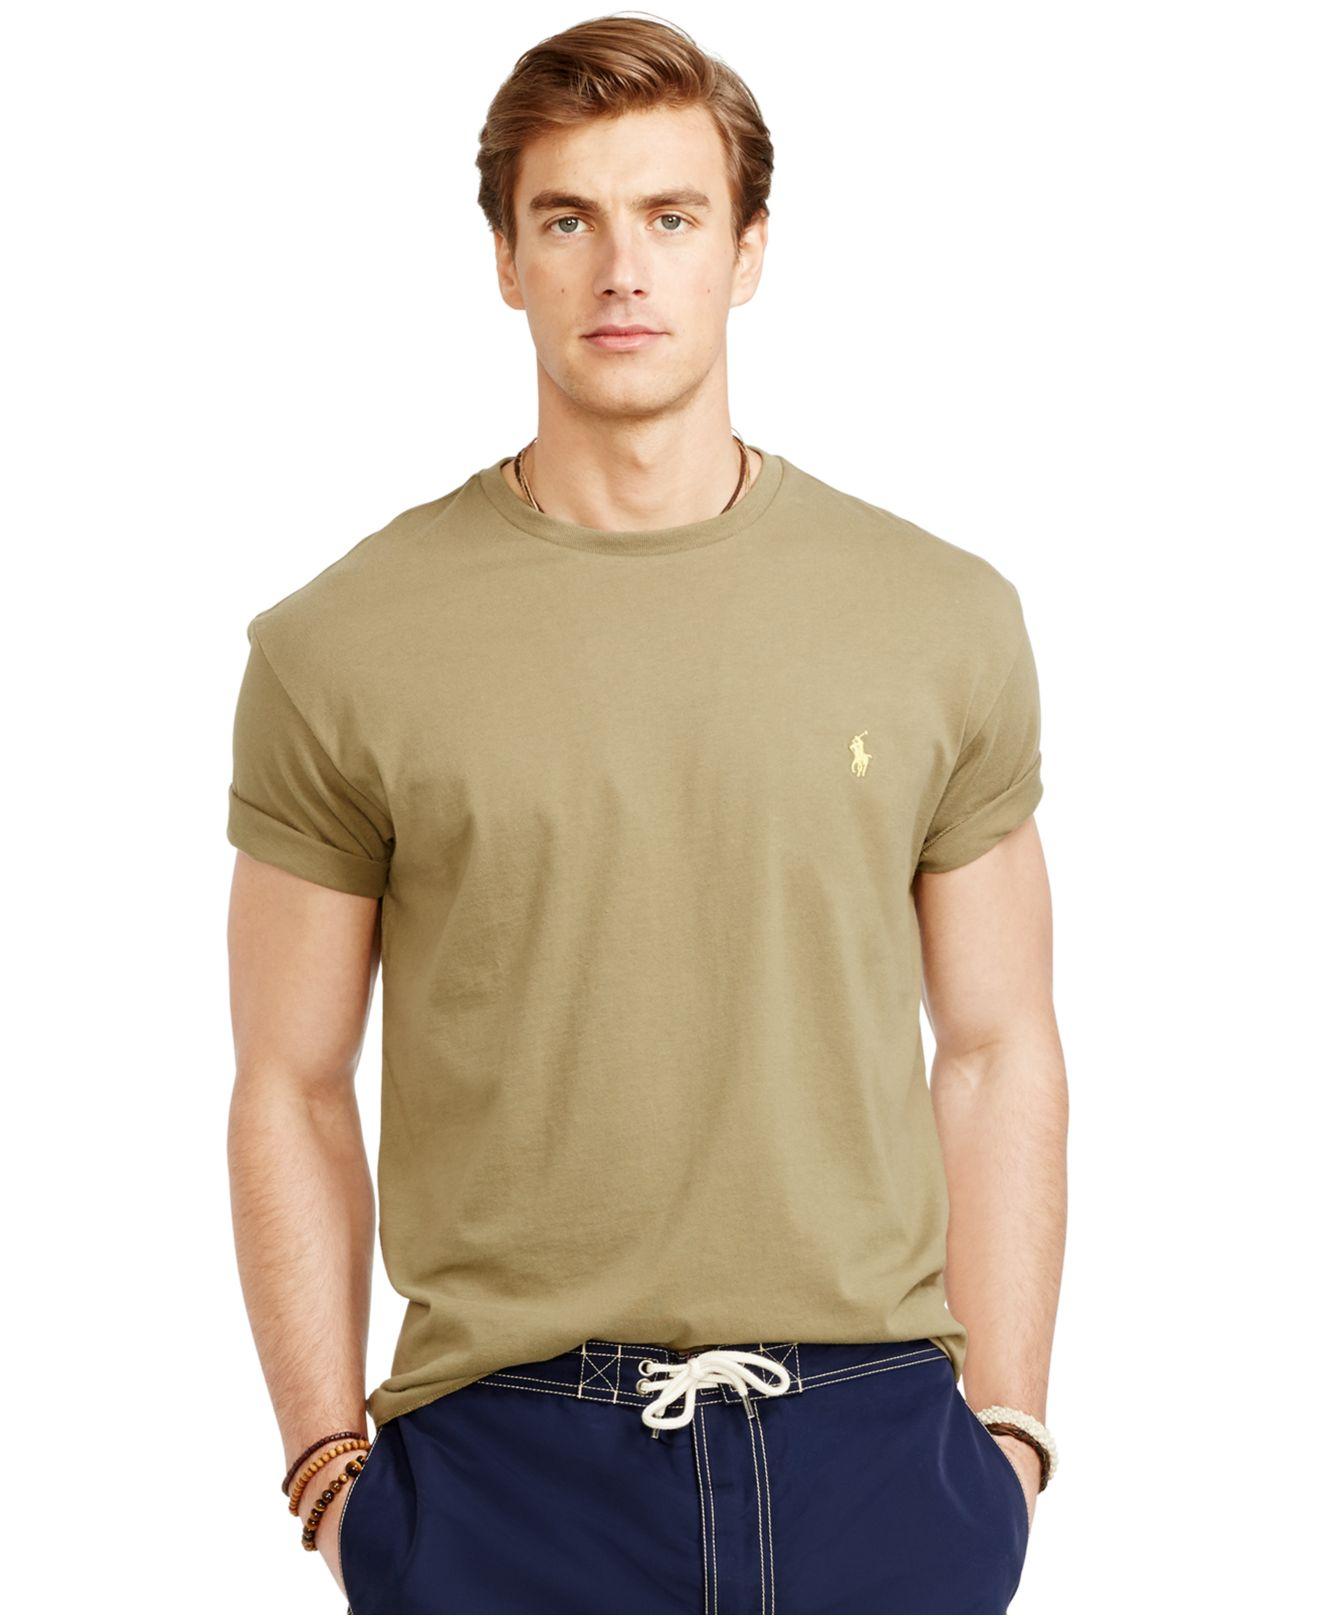 4bc22ee4865f28 Lyst - Polo Ralph Lauren Basic Custom-Fit T-Shirt in Green for Men